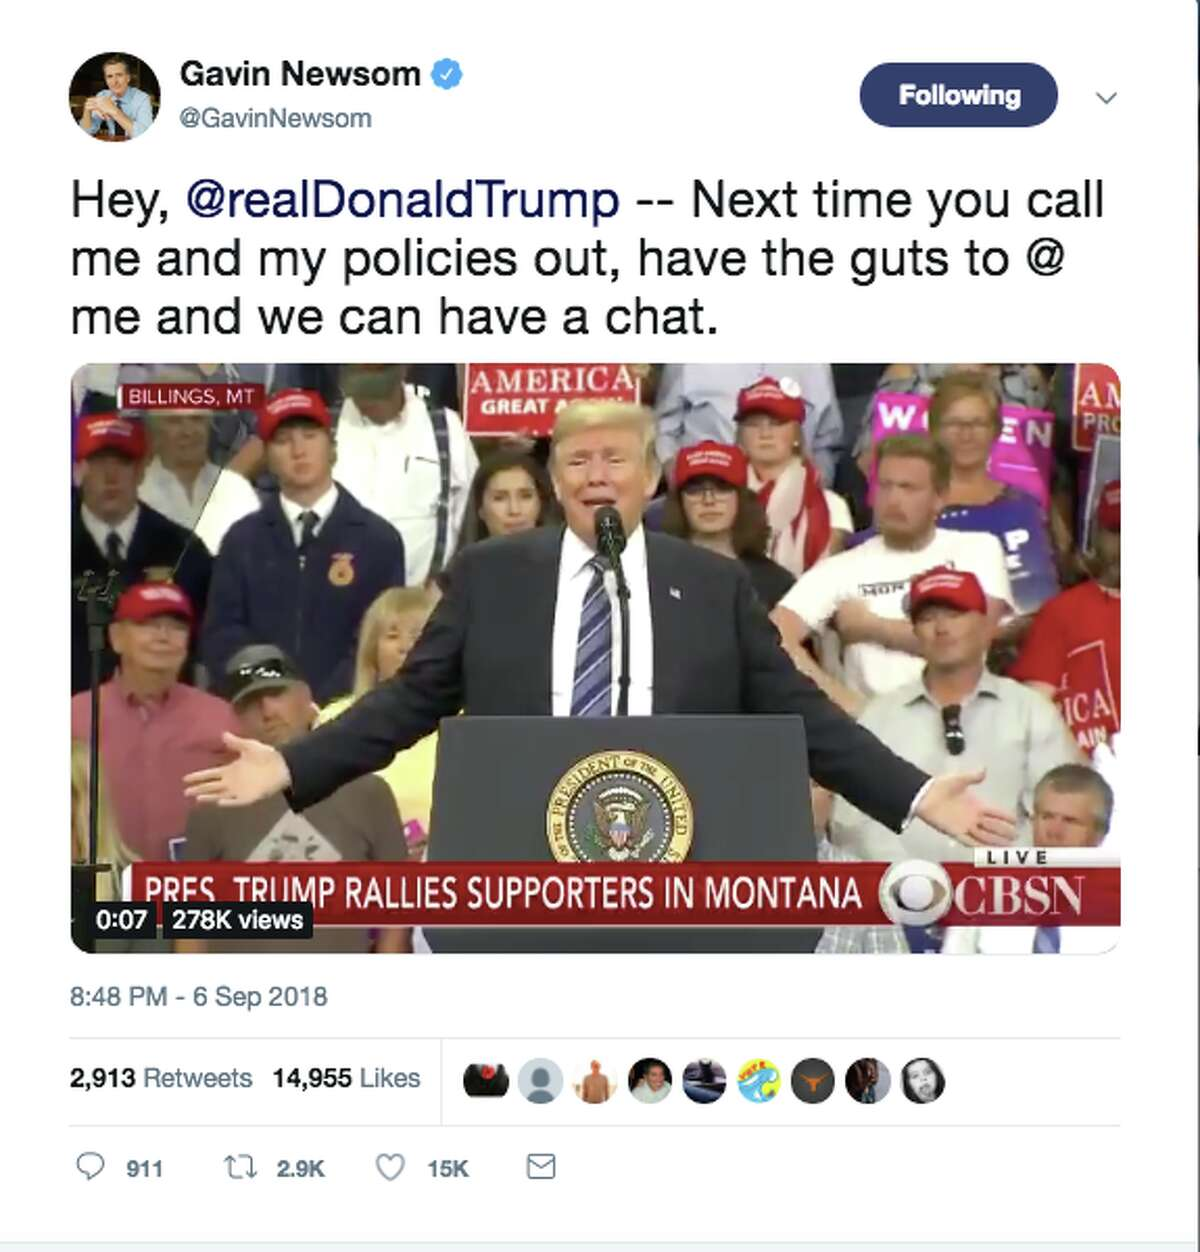 Gavin Newsom responded to Trump on Twitter saying,